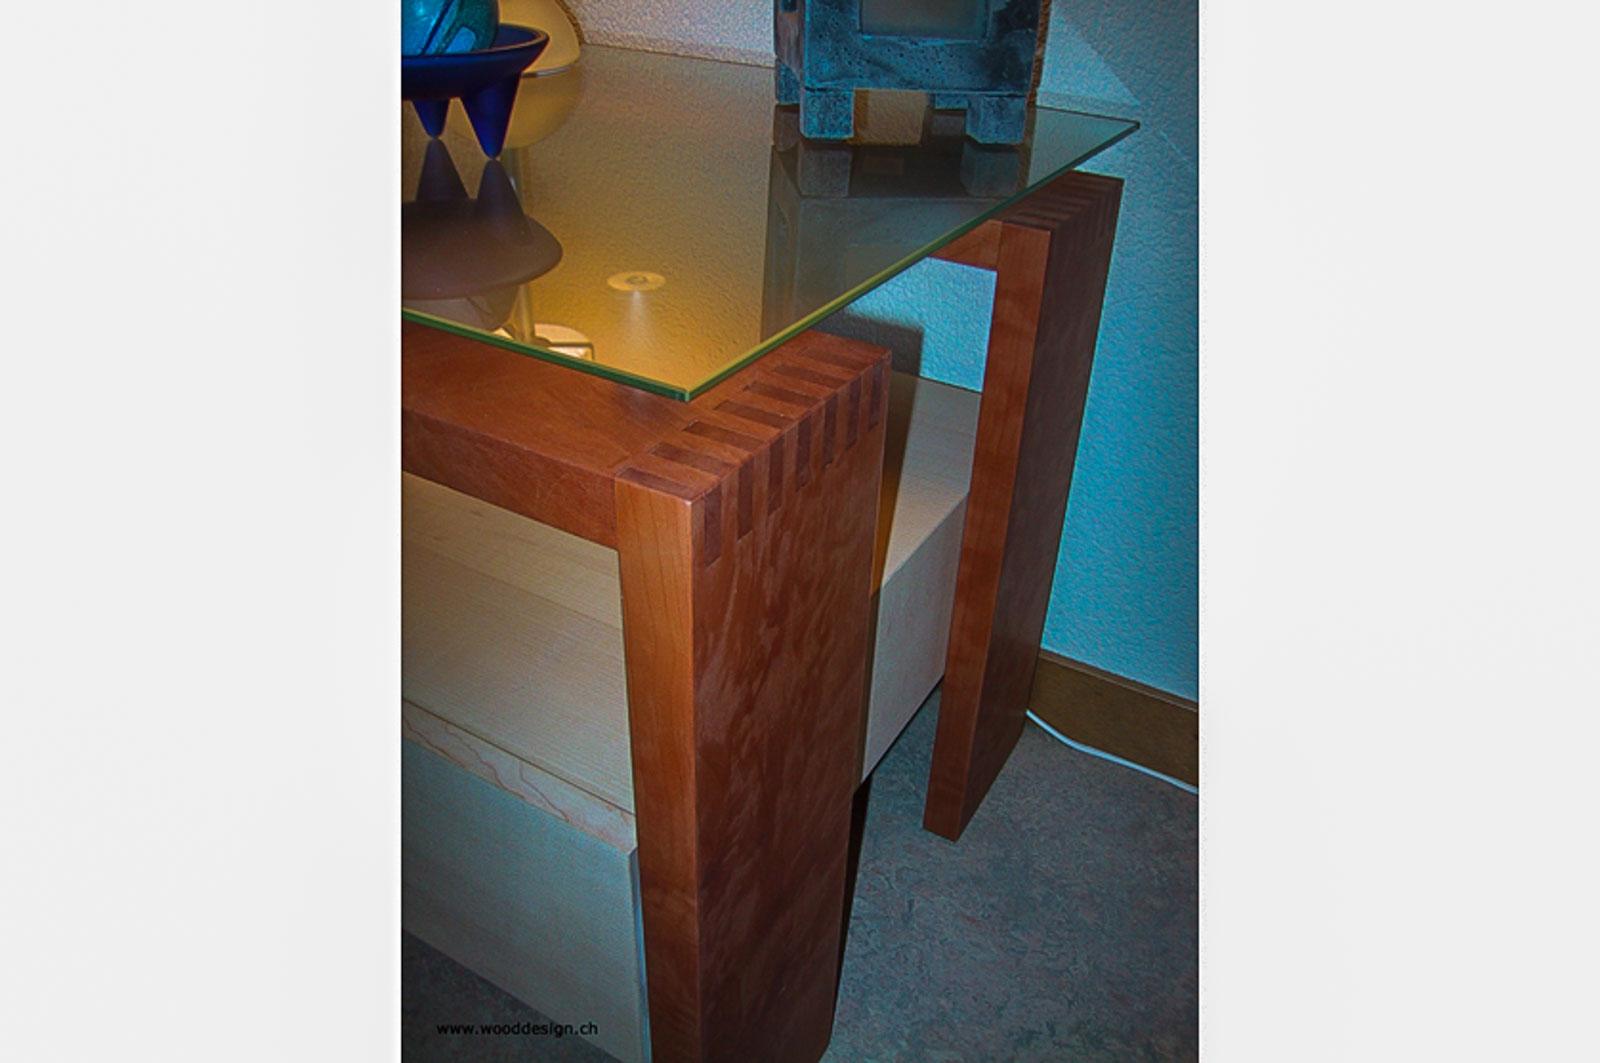 Wooddesign_Bett_Trinatura_Kopfteil_ Massivholz-Nachttischli (3)